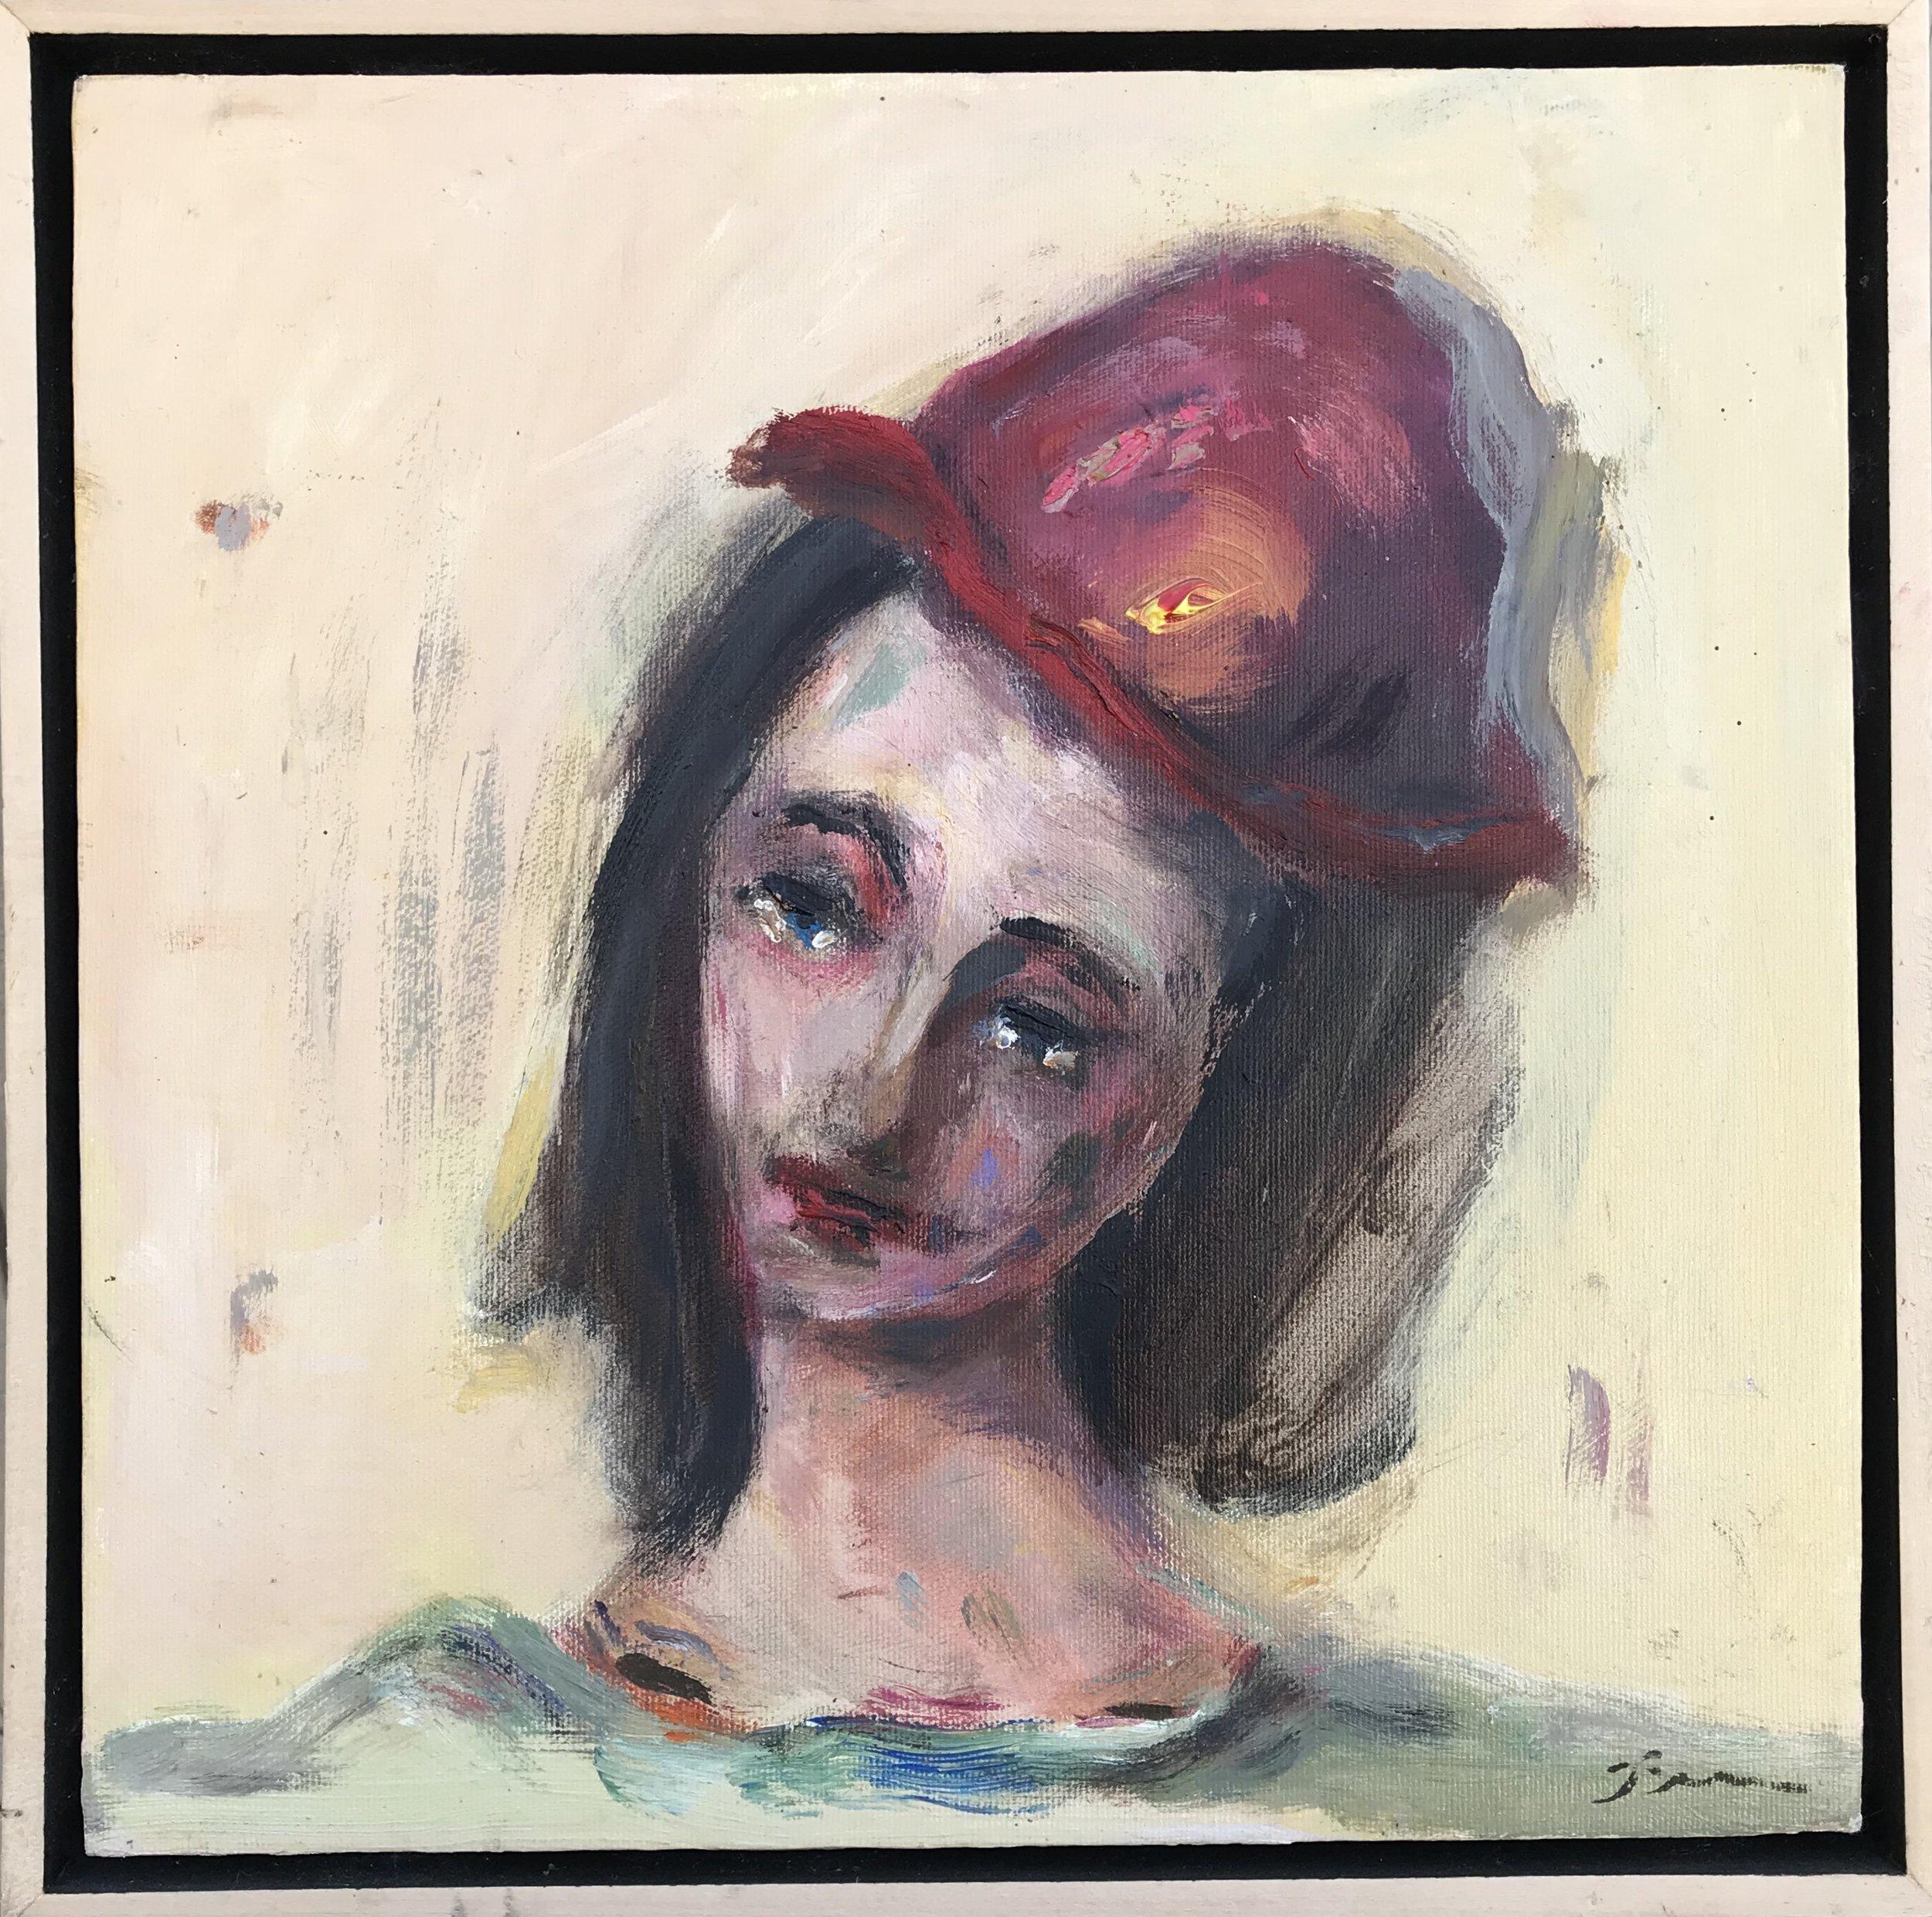 """Dixie"" - 12"" x 12"" in 2 1/2"" floater frameValue: $950Opening bid: $350email your bid to: art@bradfordbrenner.com"